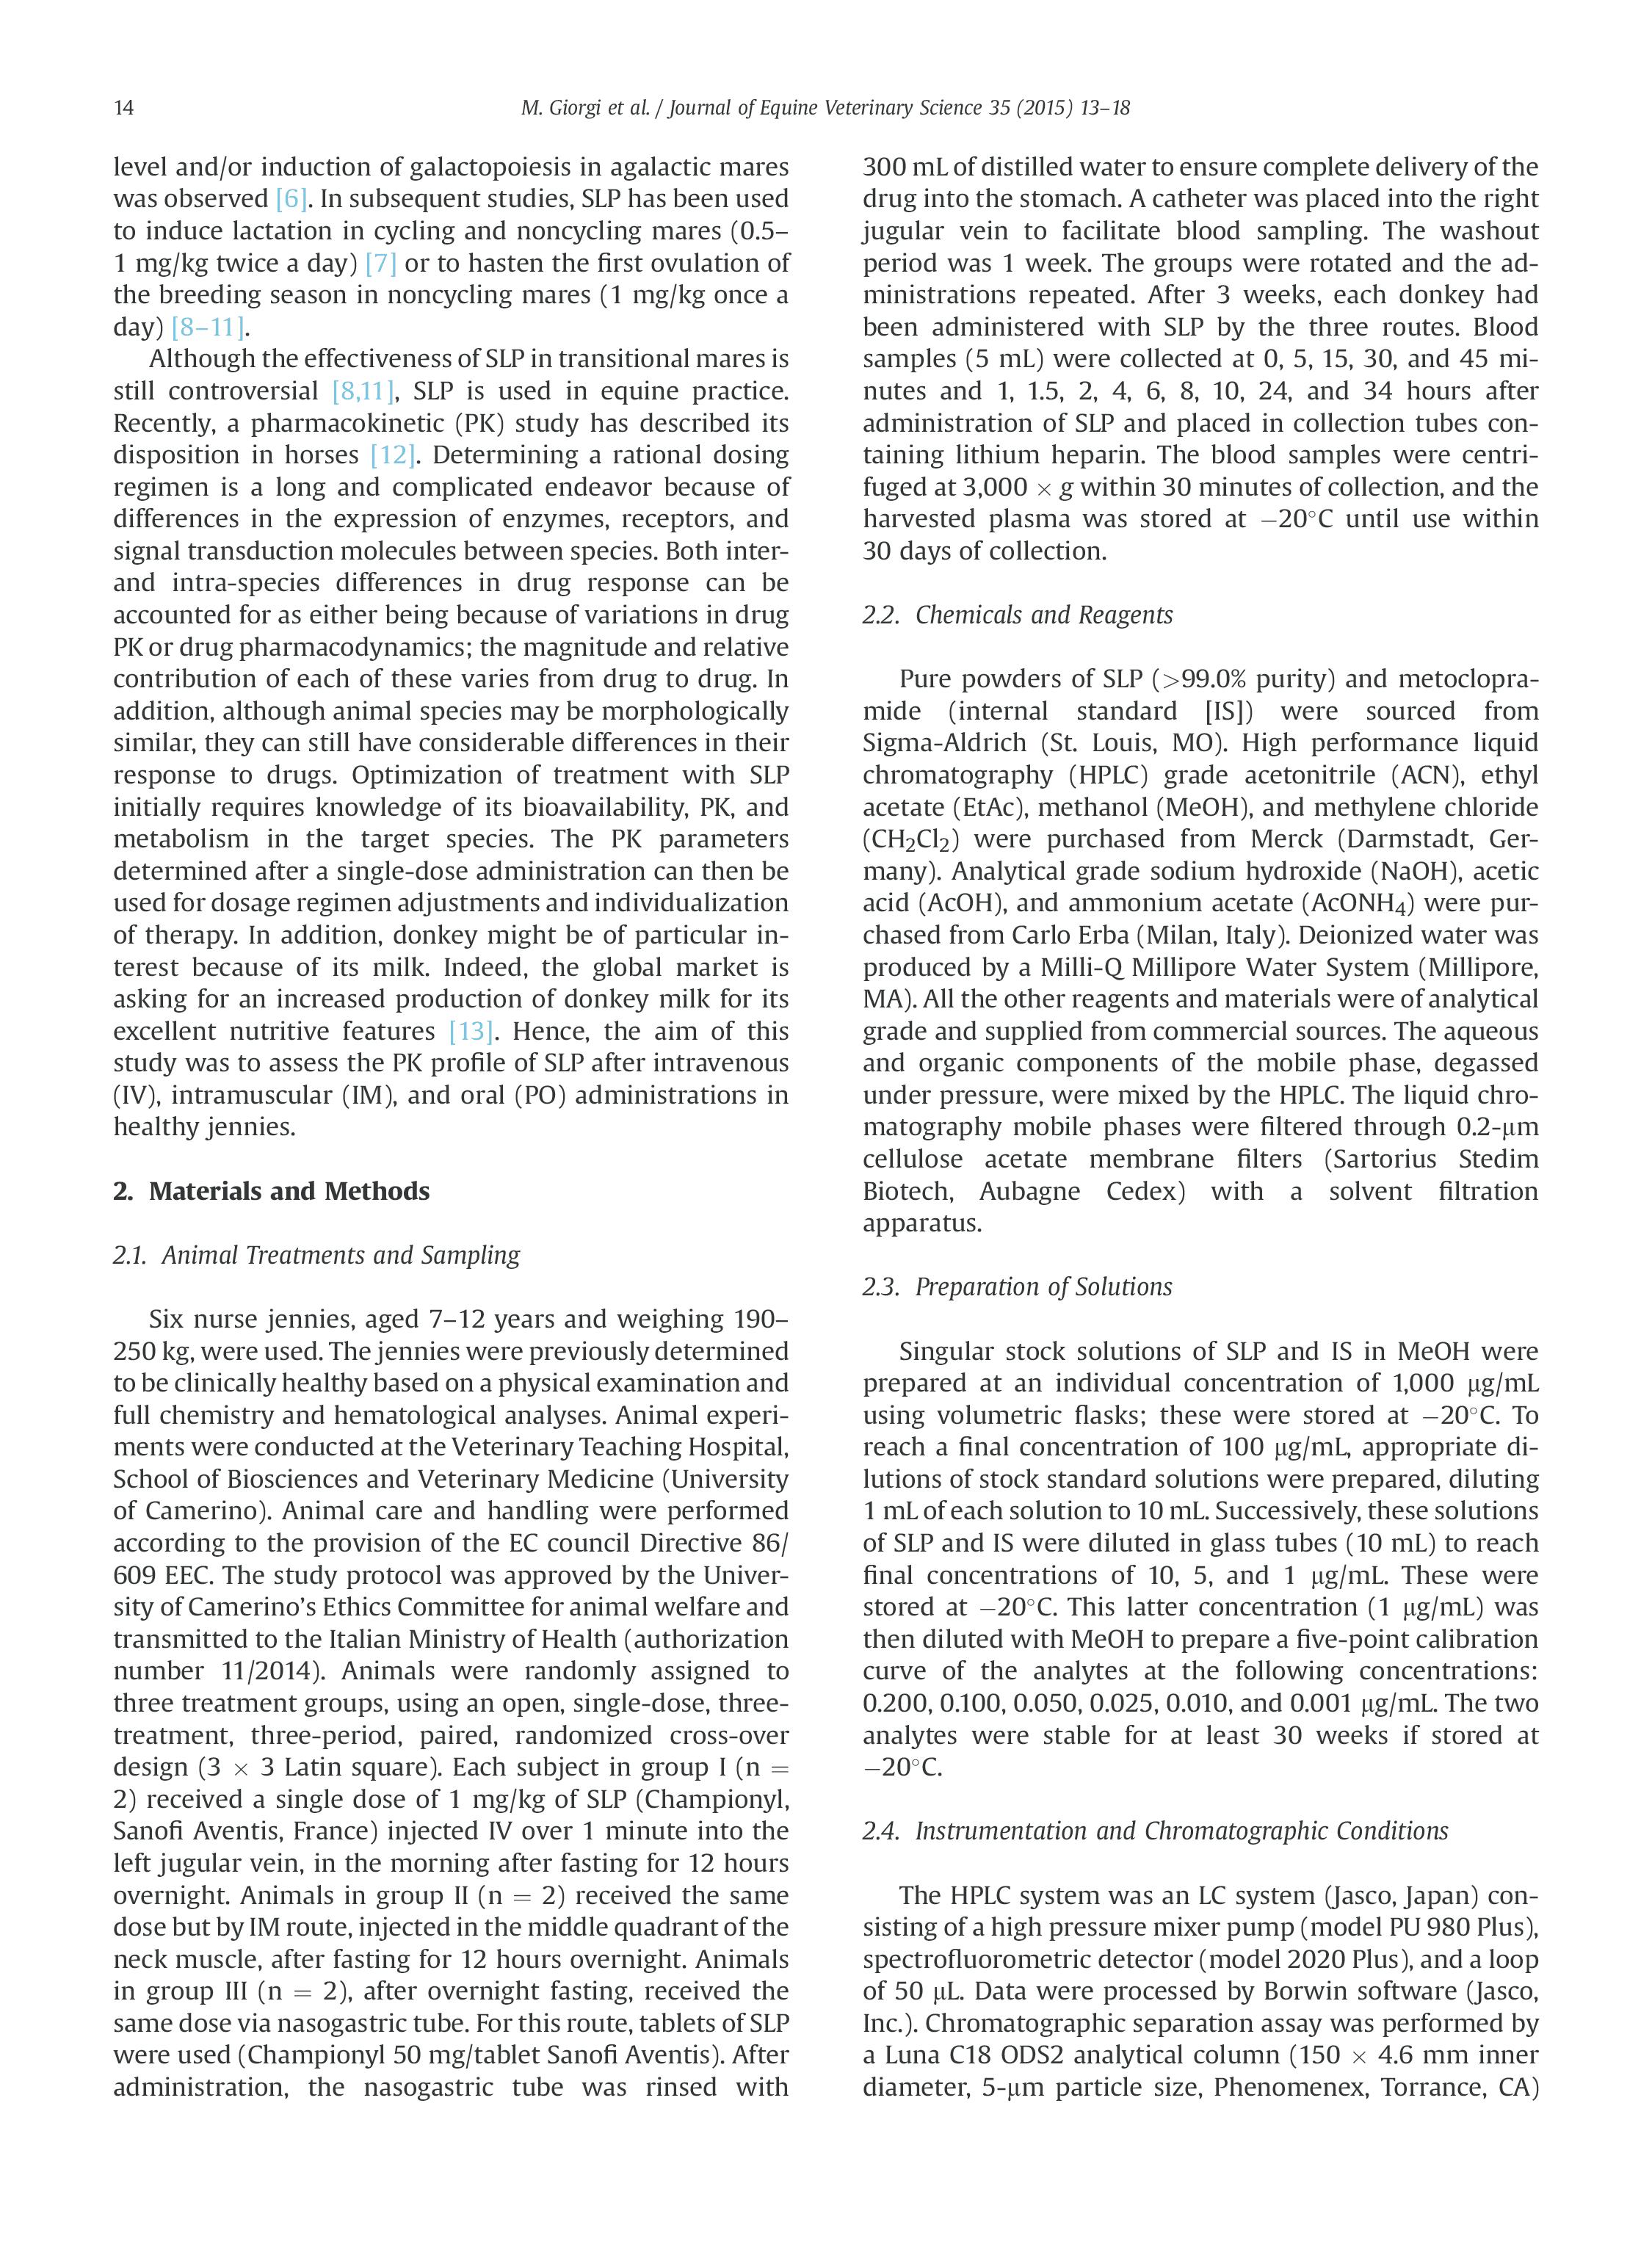 pharmacokinetic_jenniesrepro_ovulation-1.png